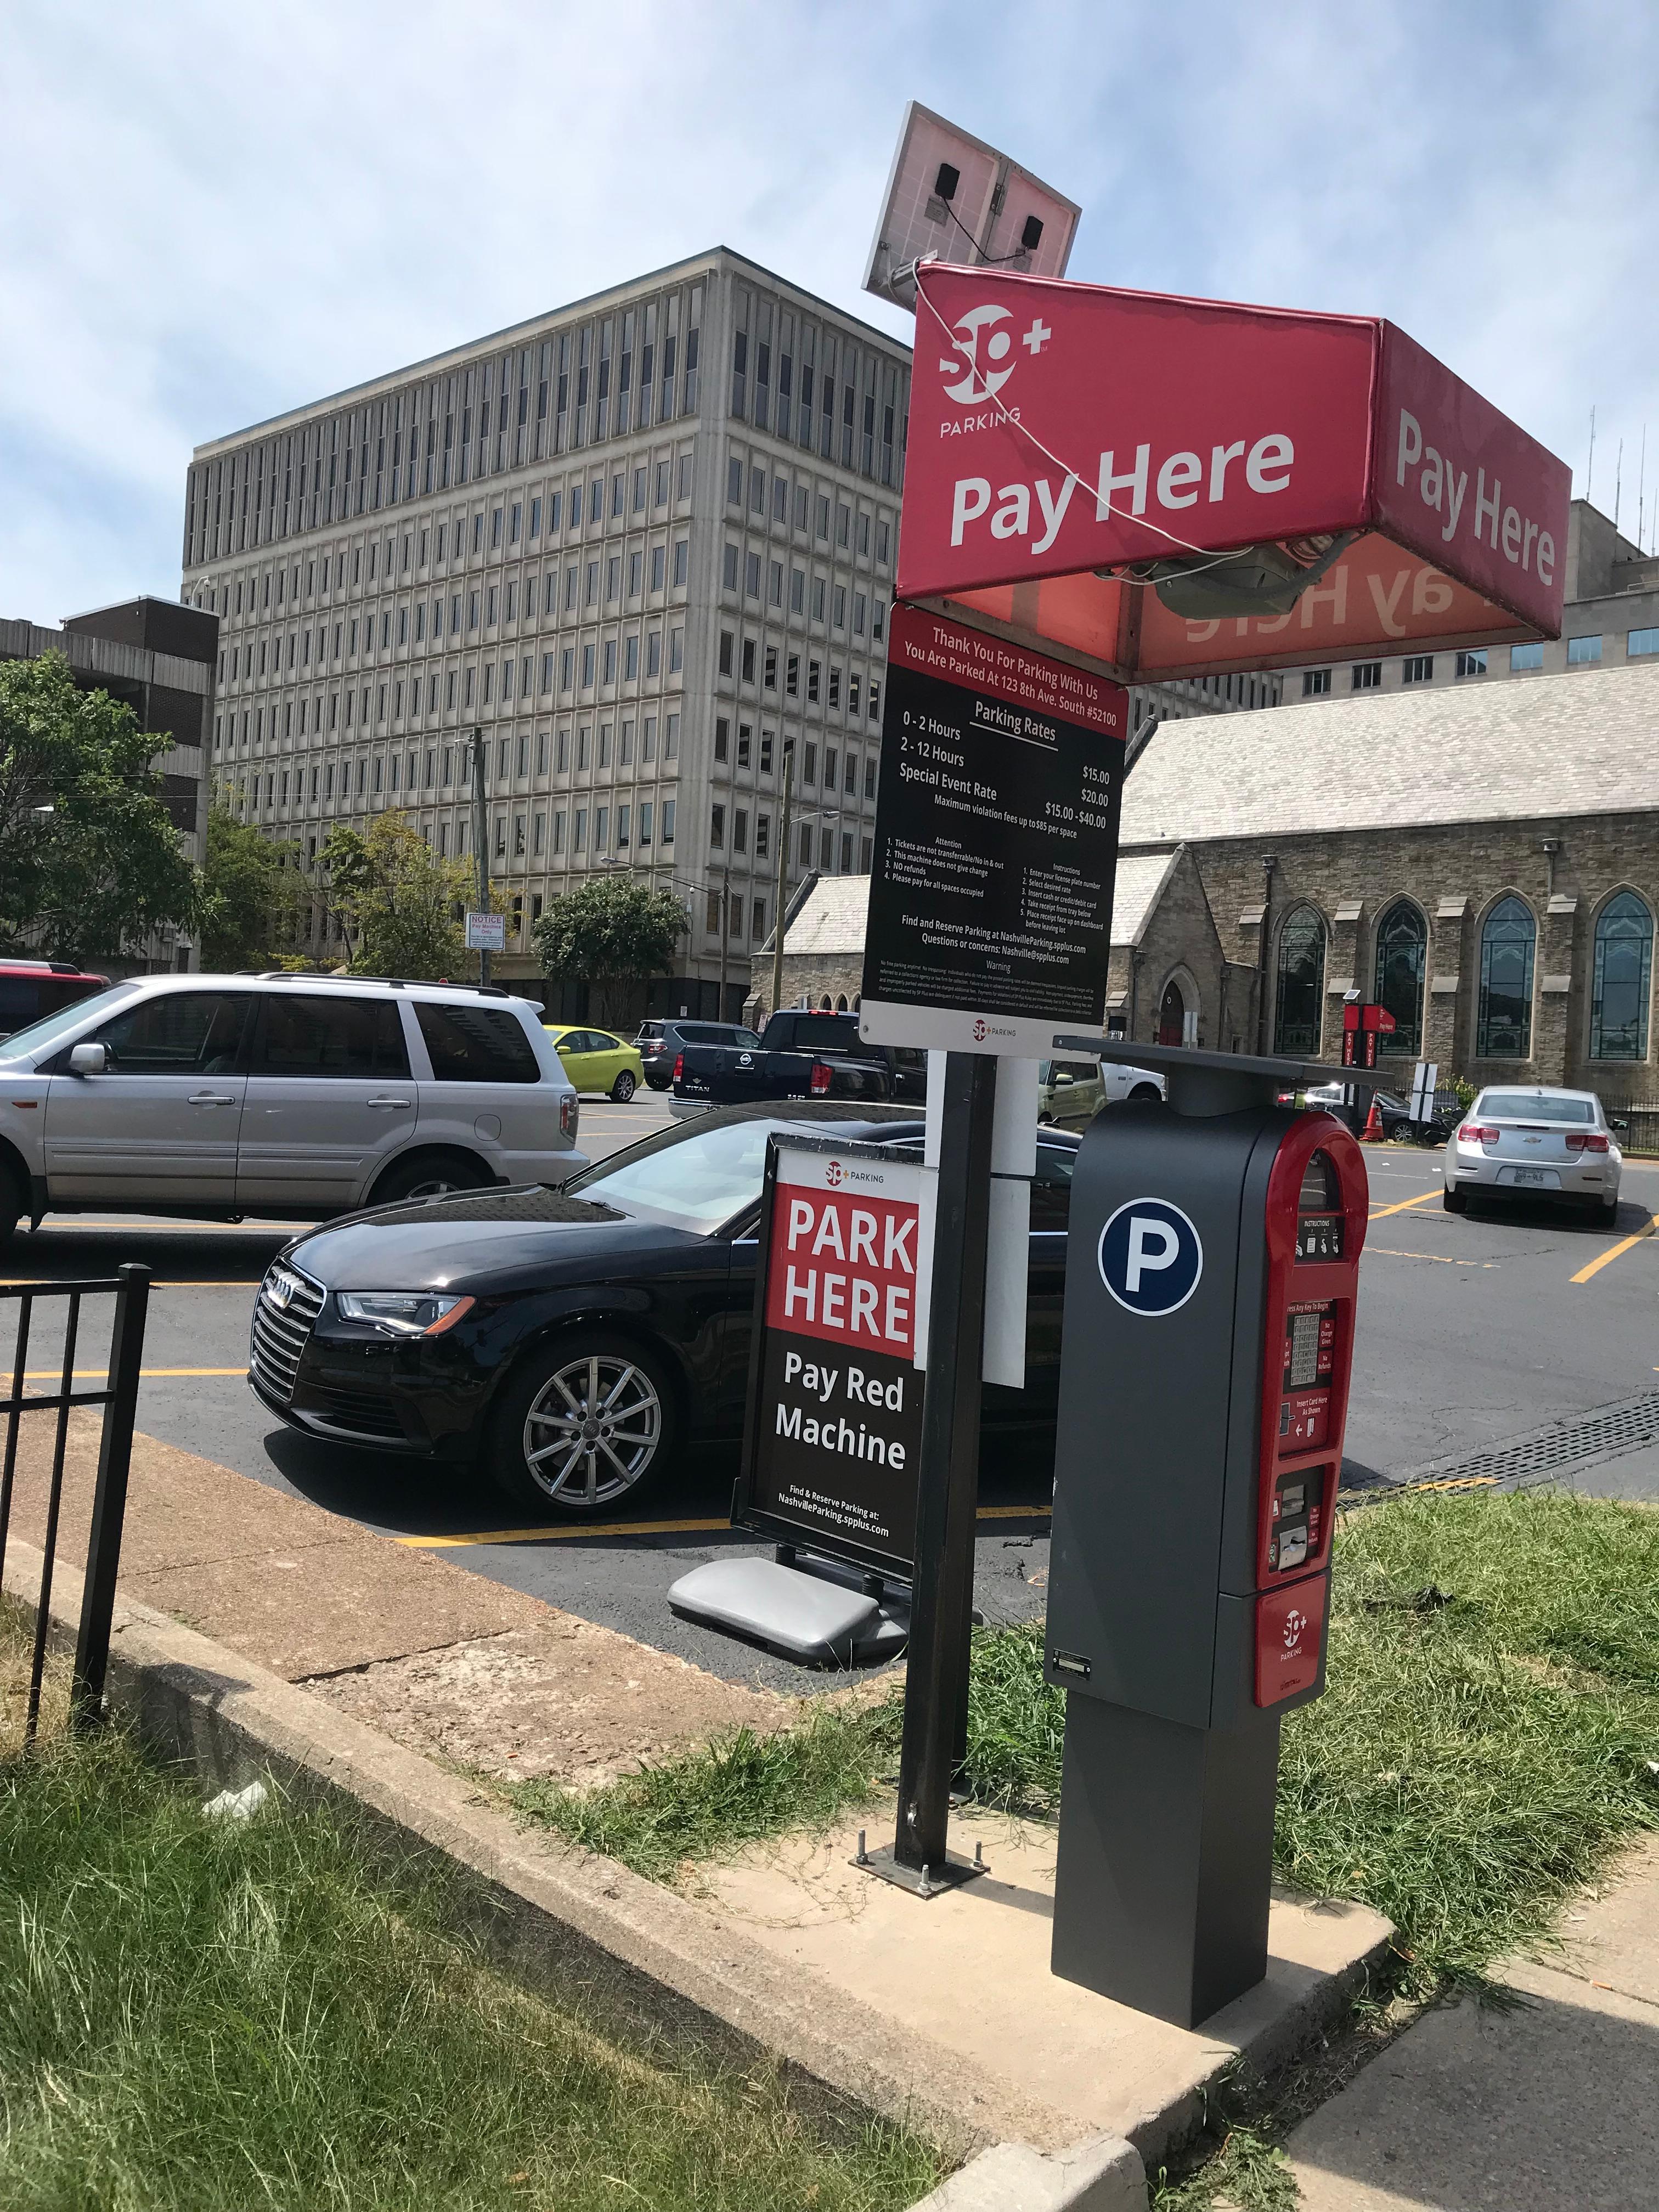 SP+ Parking image 3